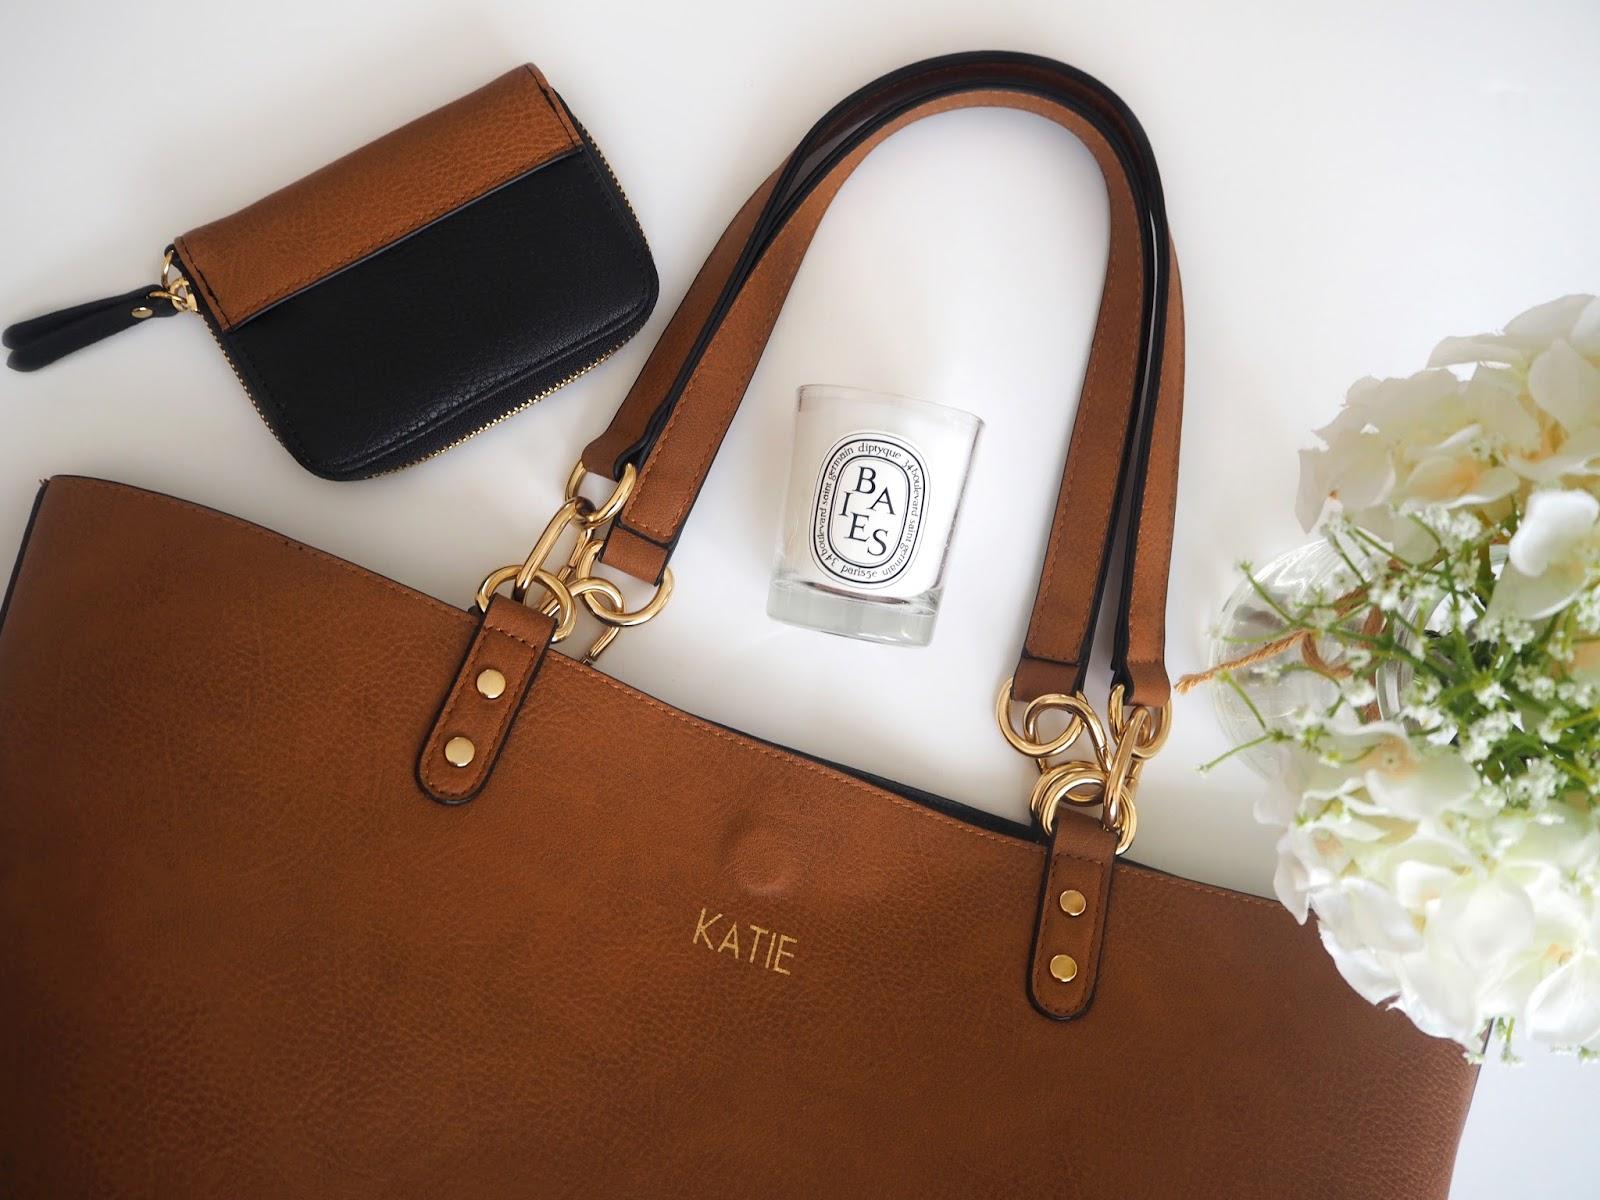 Oasis Love Letters Monogrammed Bags, Katie Kirk Loves, Personalised Bag, UK Blogger, UK Fashion Blogger, Monogramming, Oasis Fashion, Christmas Gift Idea